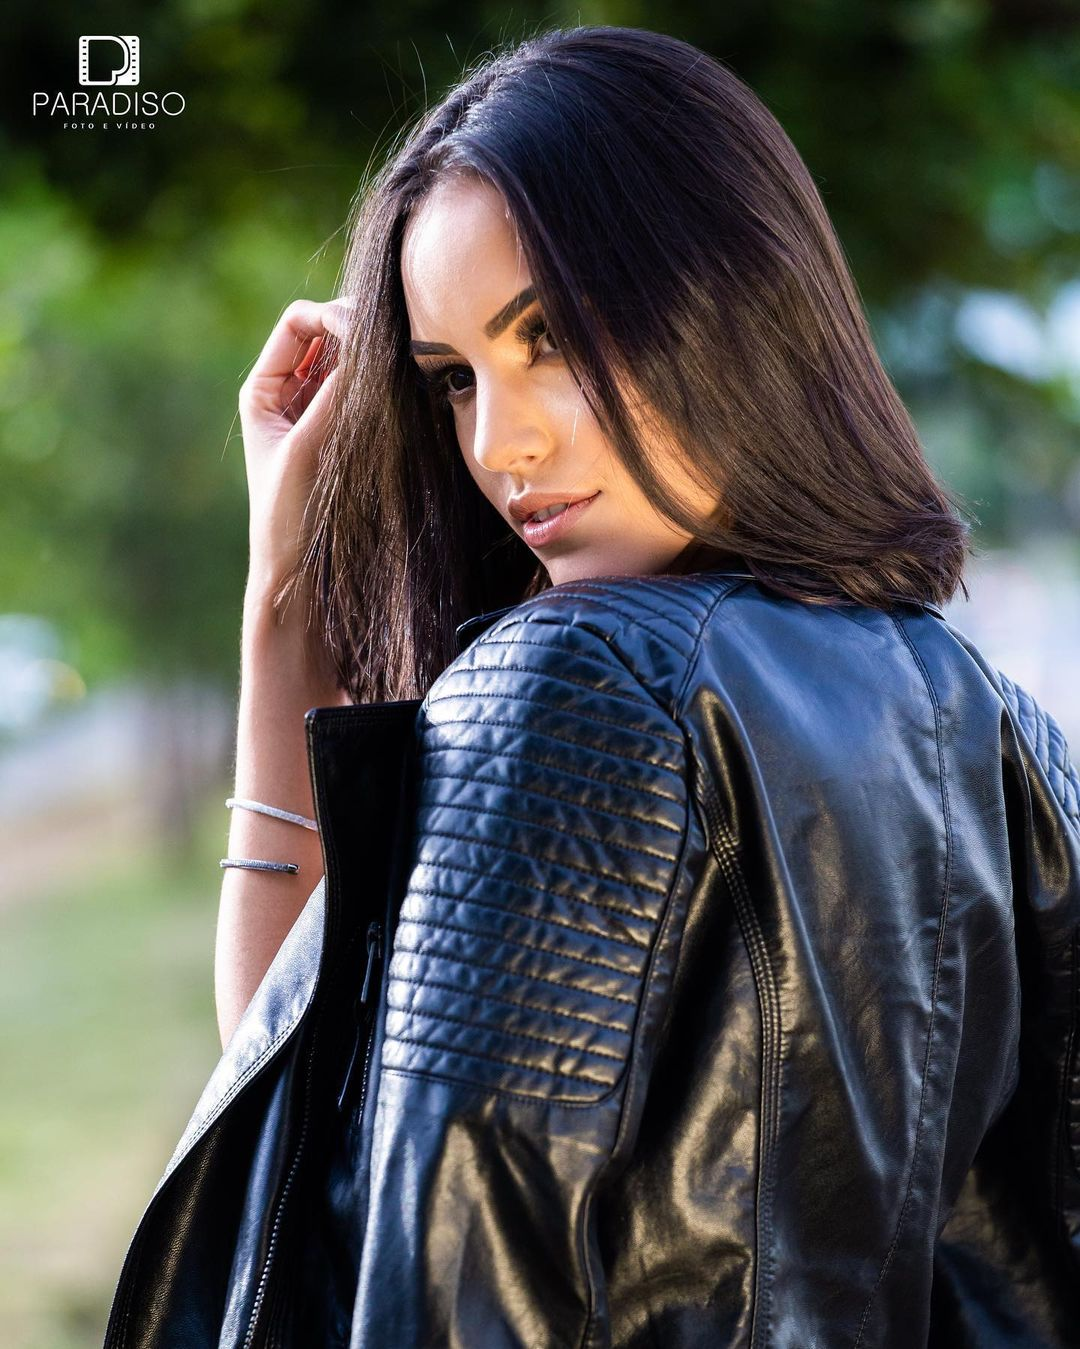 rafaella felipe, top 20 de miss brasil mundo 2019. - Página 4 10112710